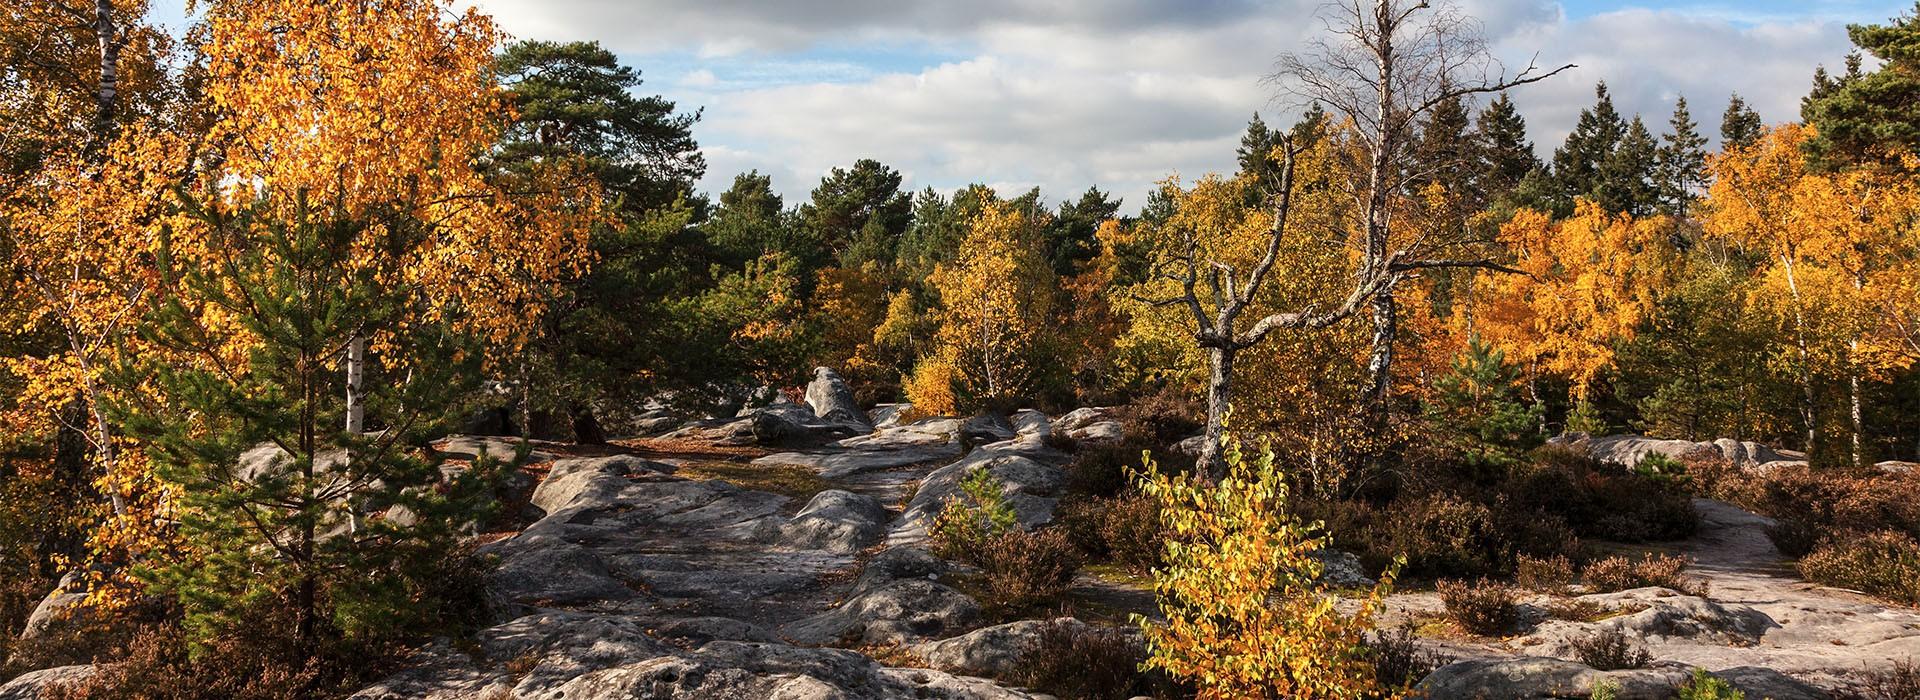 Fontainebleau4-WEB